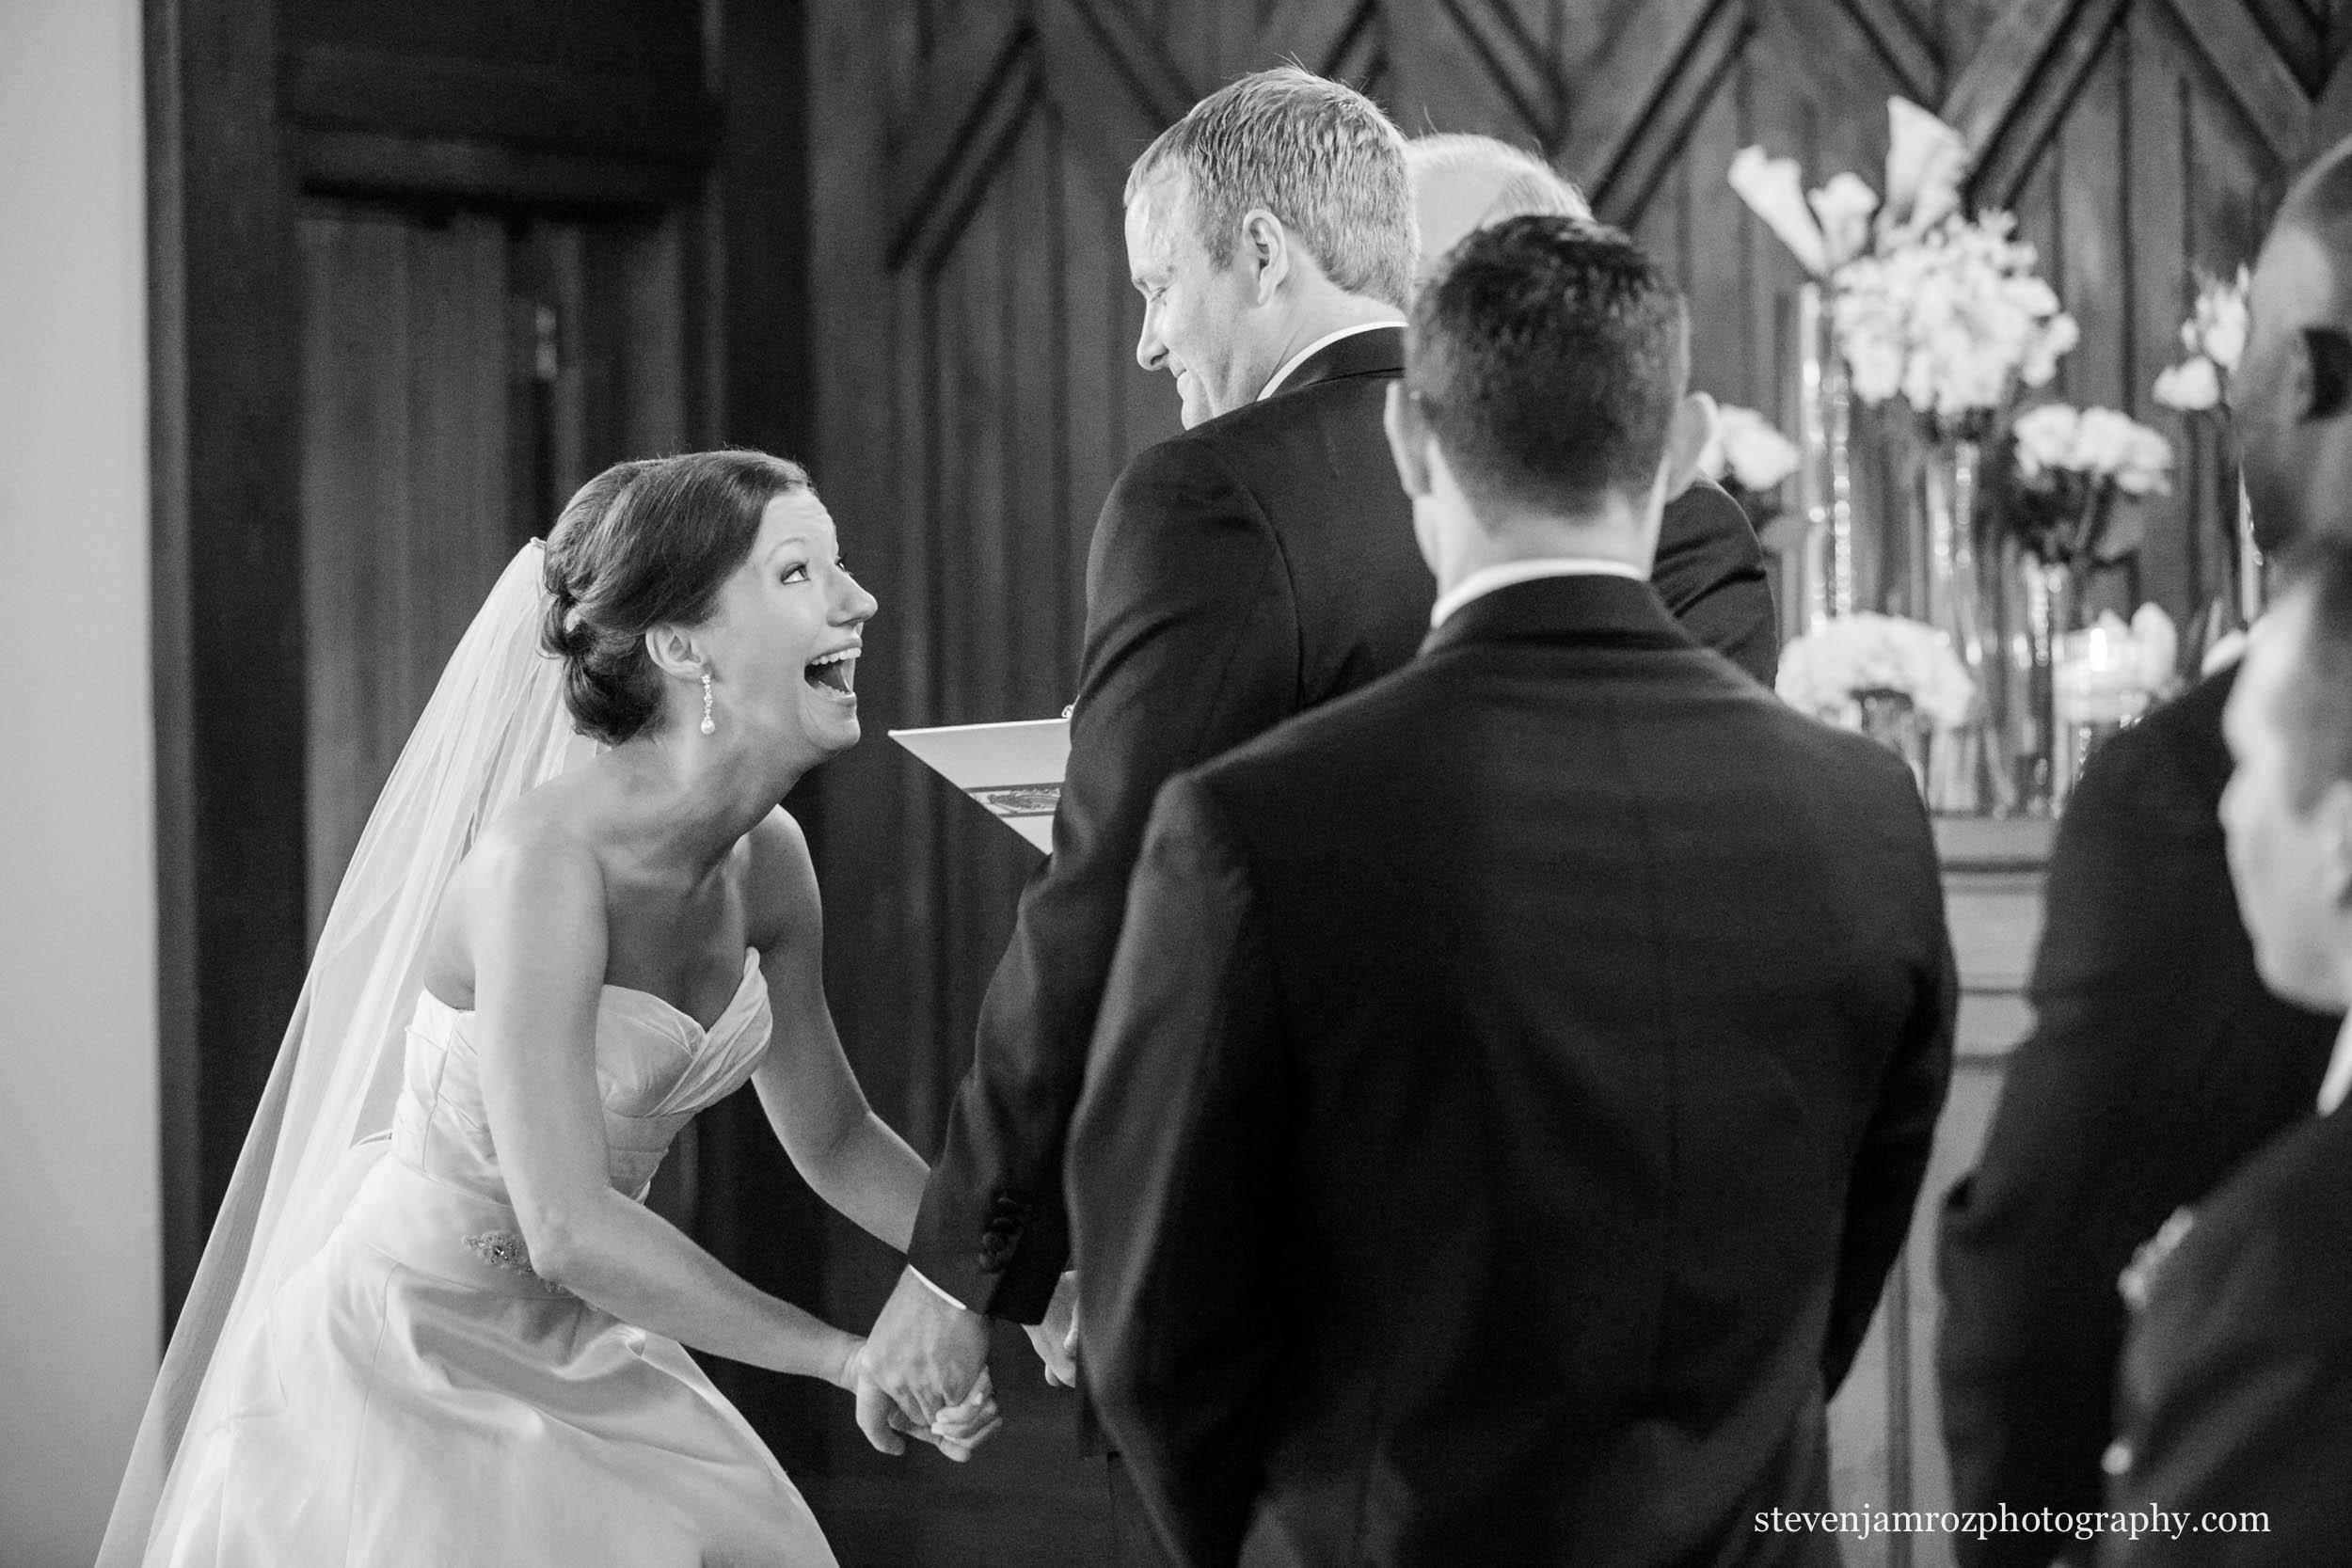 laughter-all-saints-chapel-wedding-steven-jamroz-photography-0464.jpg